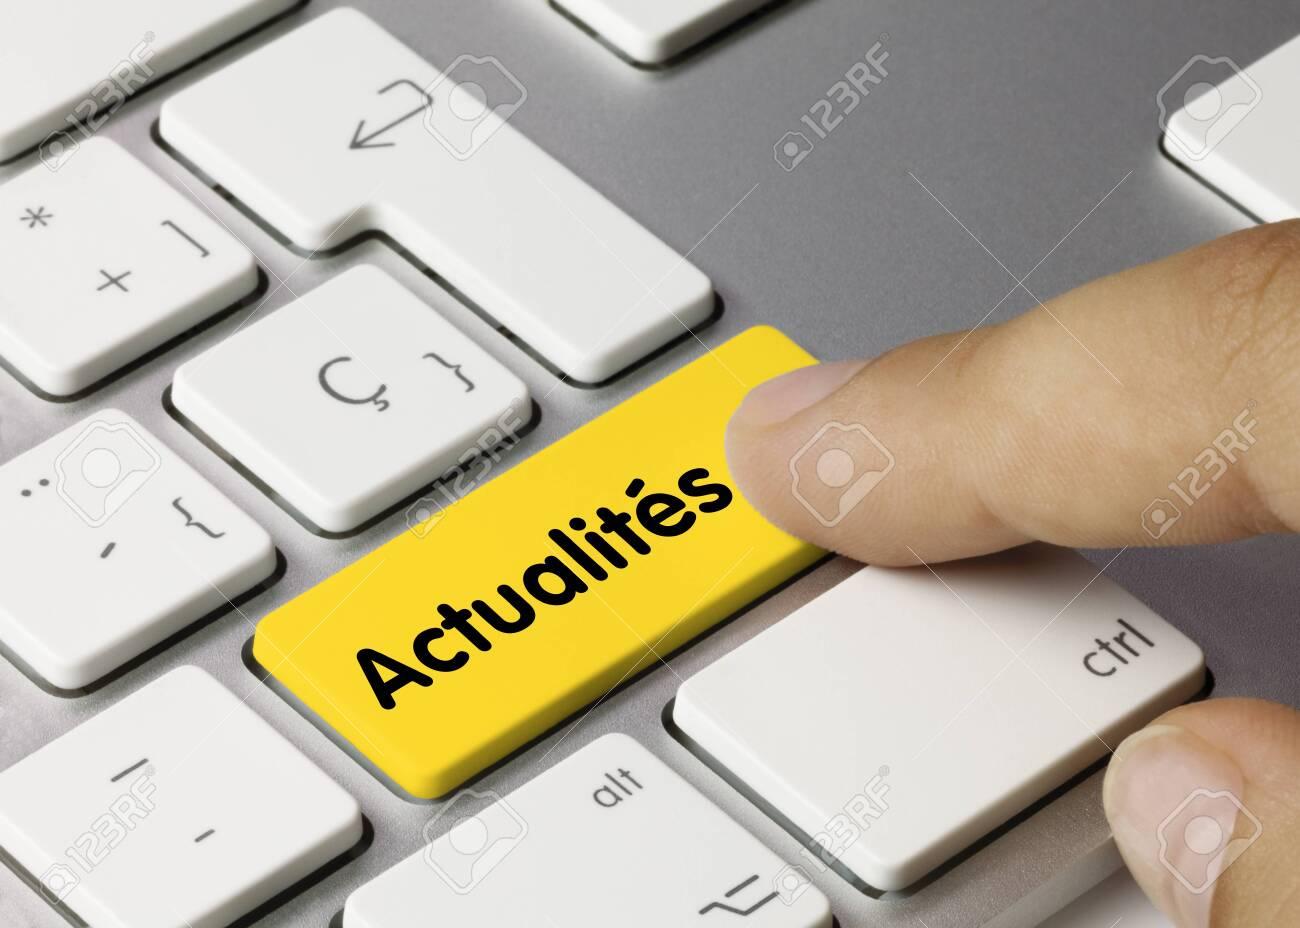 Actualités Written on Yellow Key of Metallic Keyboard. Finger pressing key. - 147231351